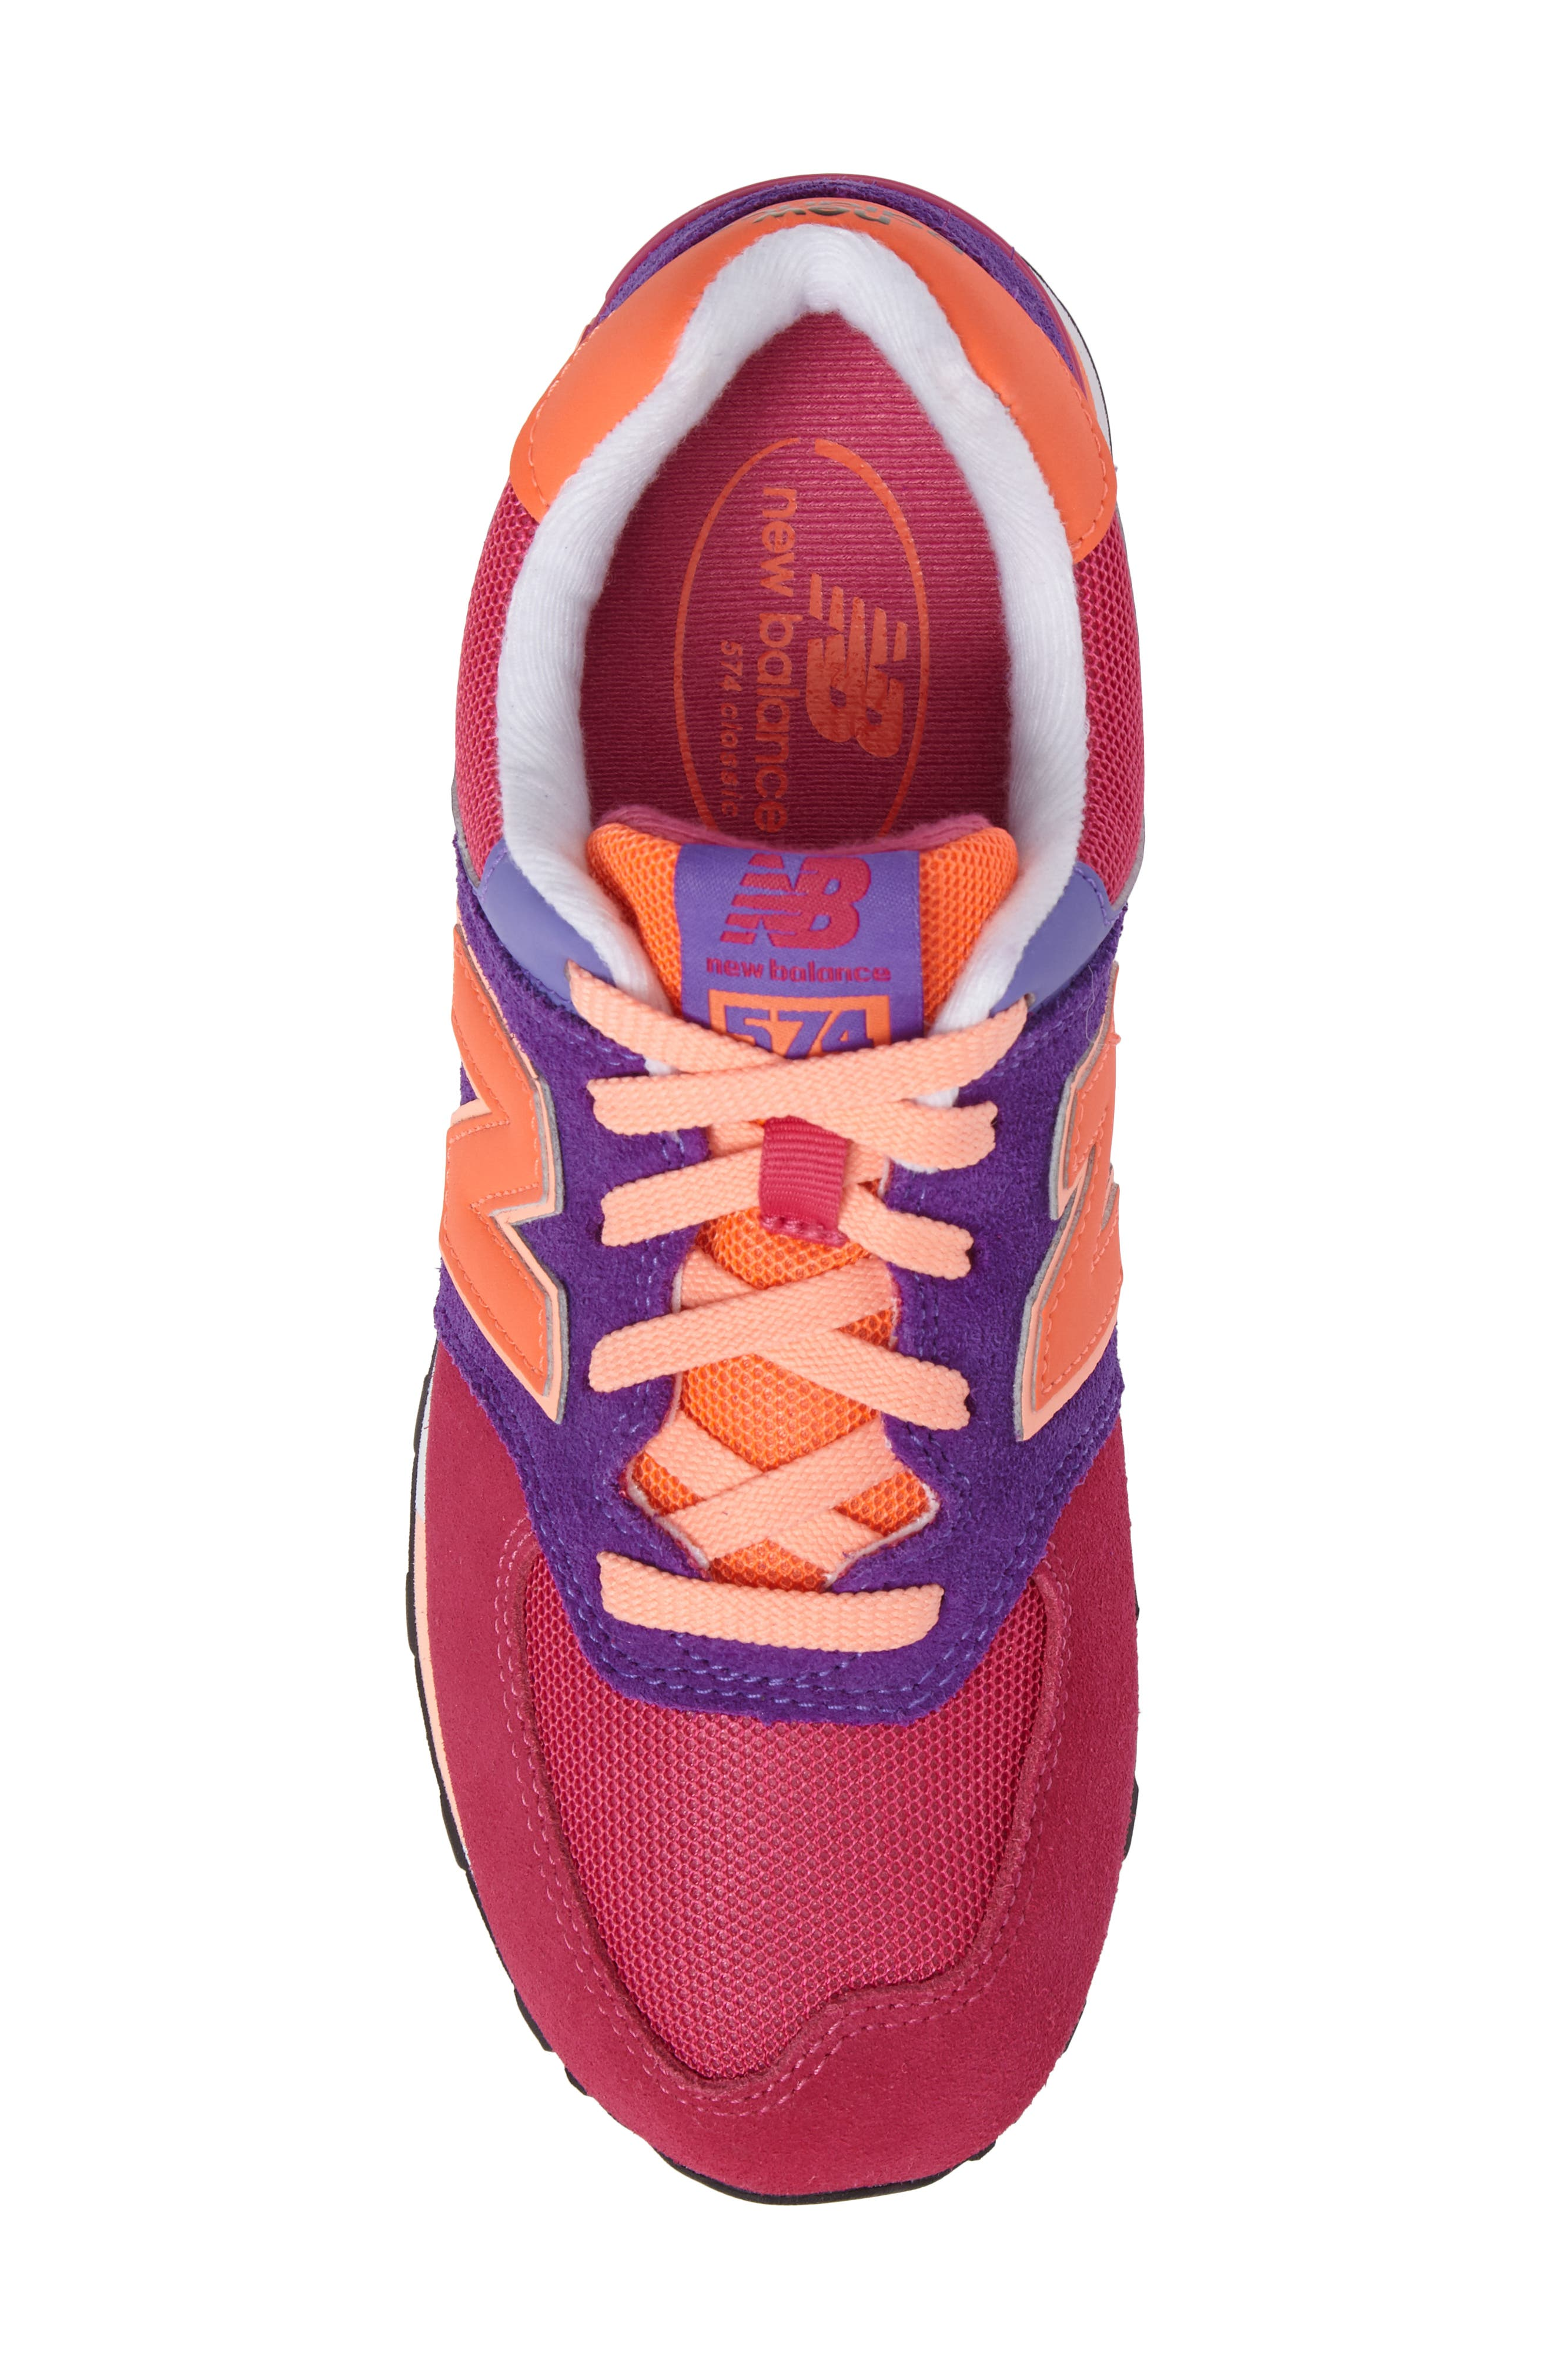 574 Cut & Paste Sneaker,                             Alternate thumbnail 5, color,                             Pink/ Purple